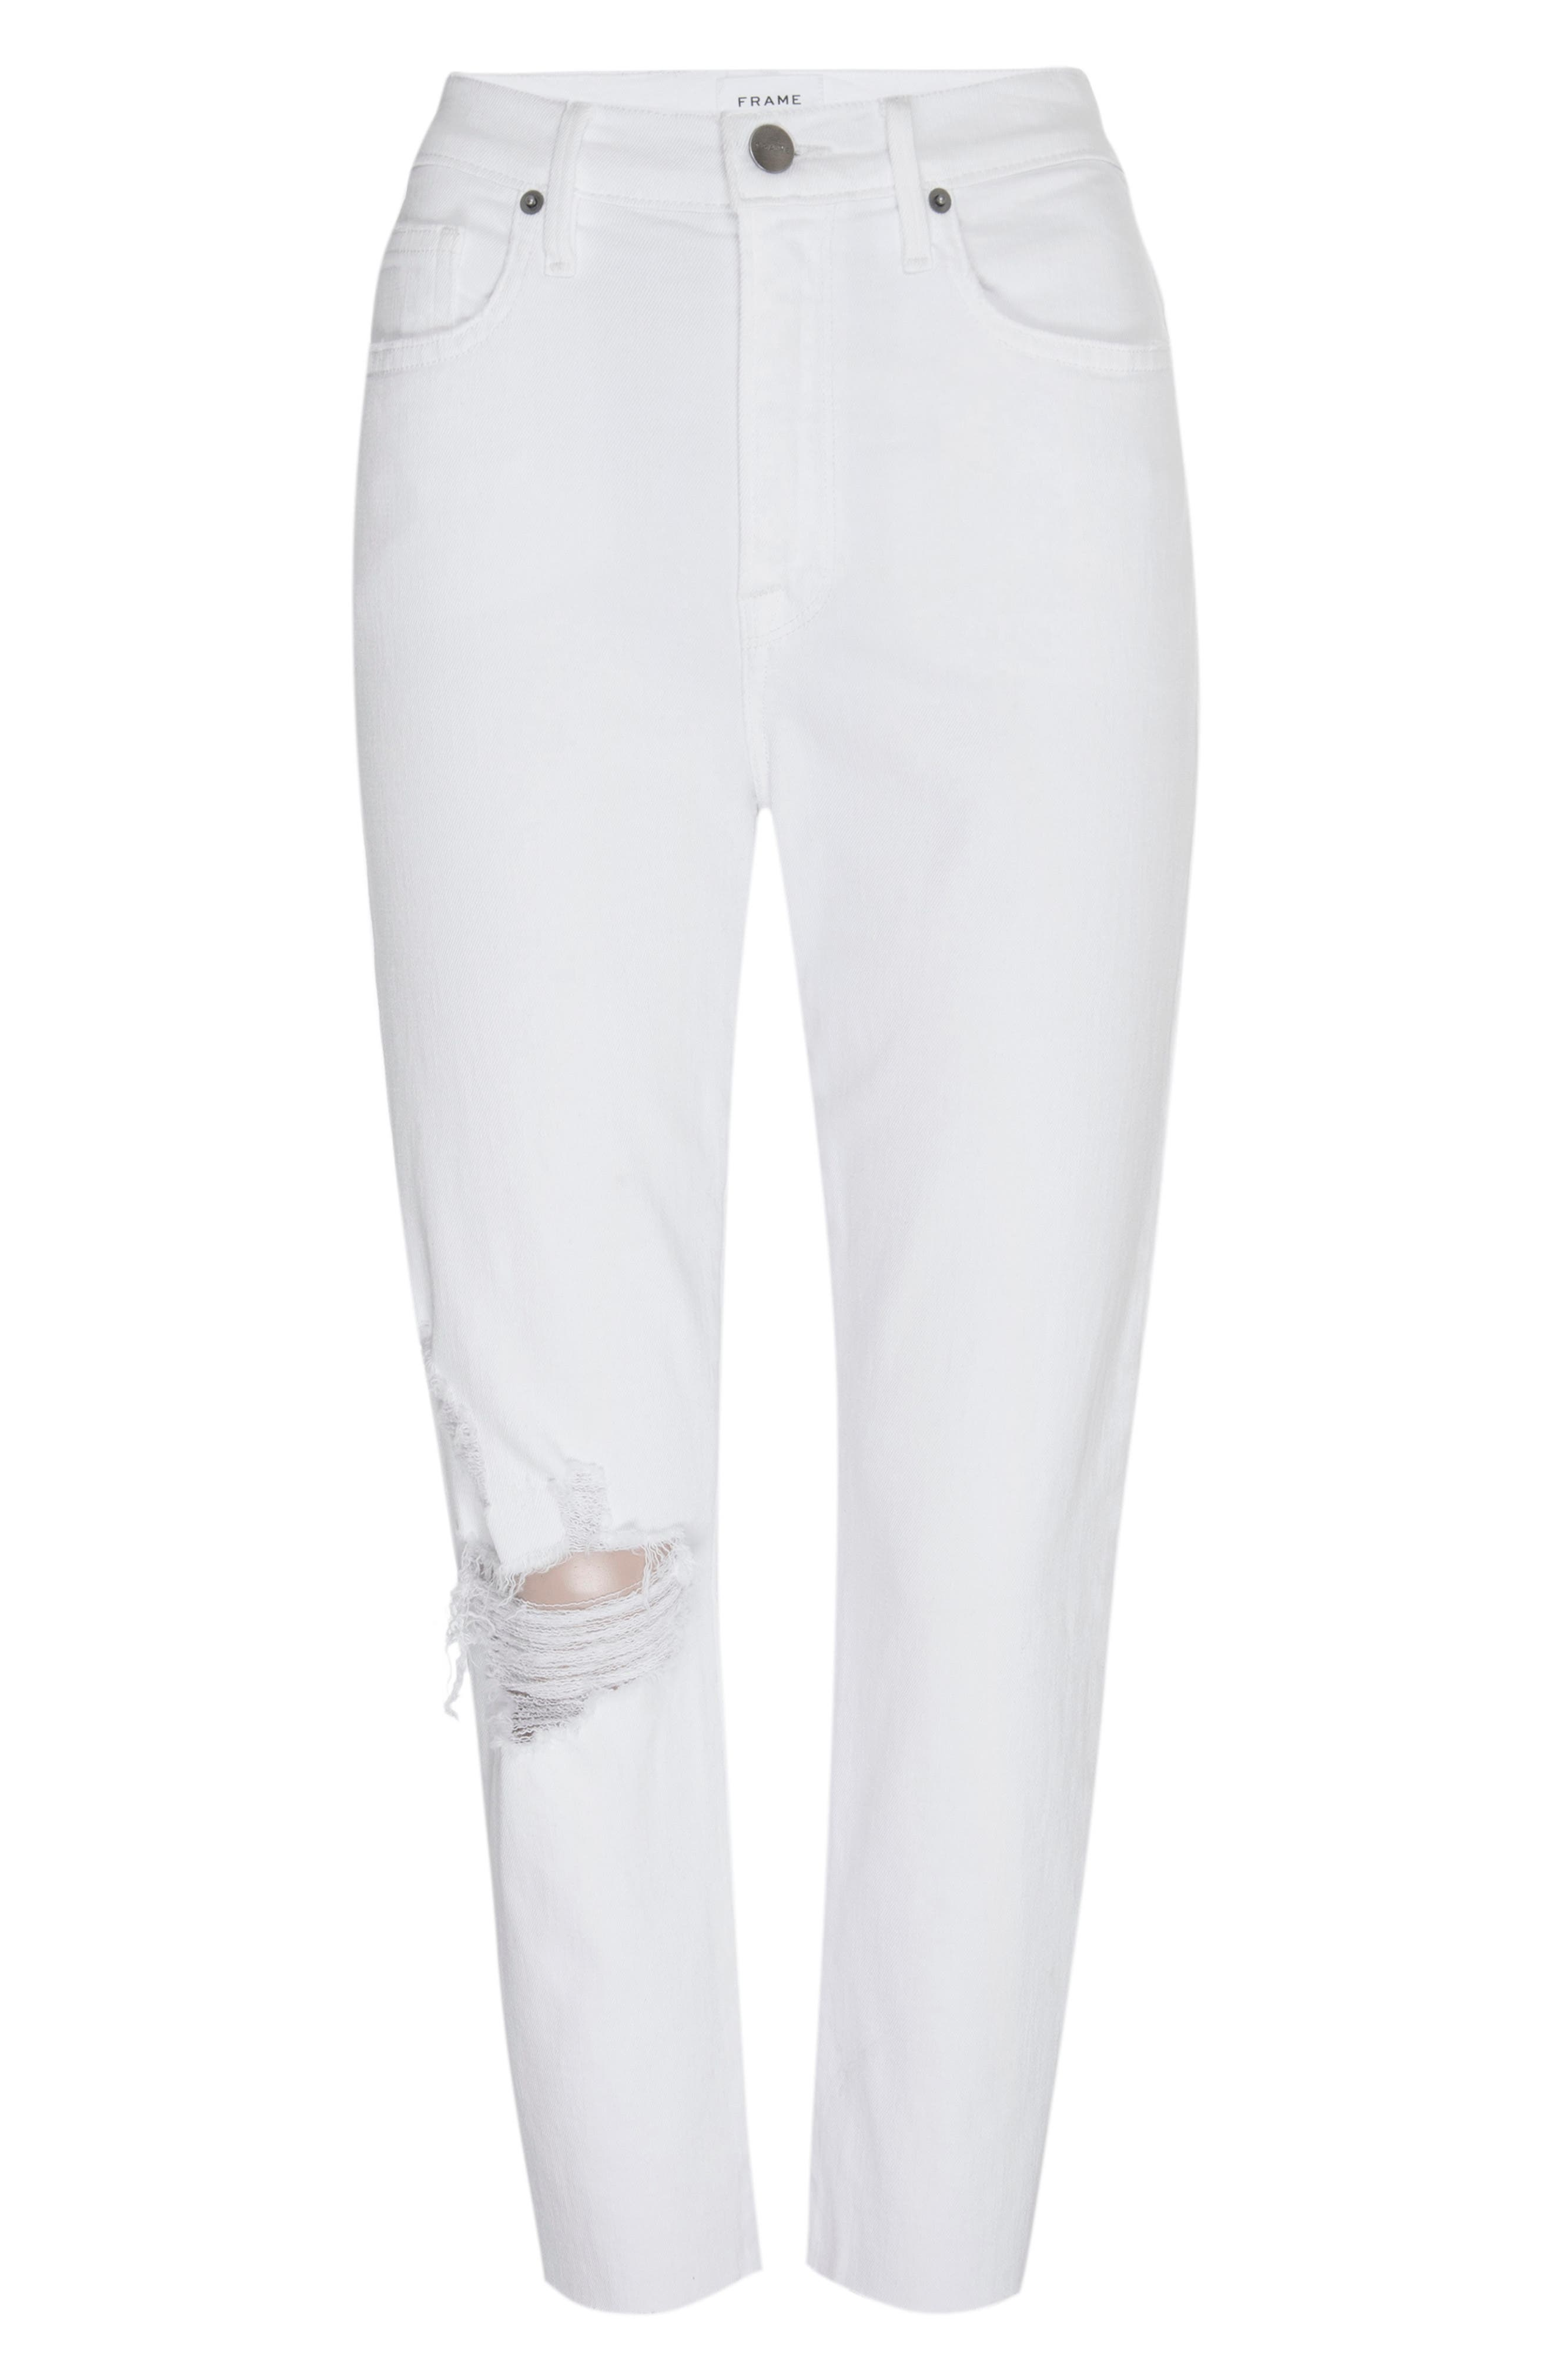 Image of FRAME Le Beau Ripped Crop Straight Leg Boyfriend Jeans